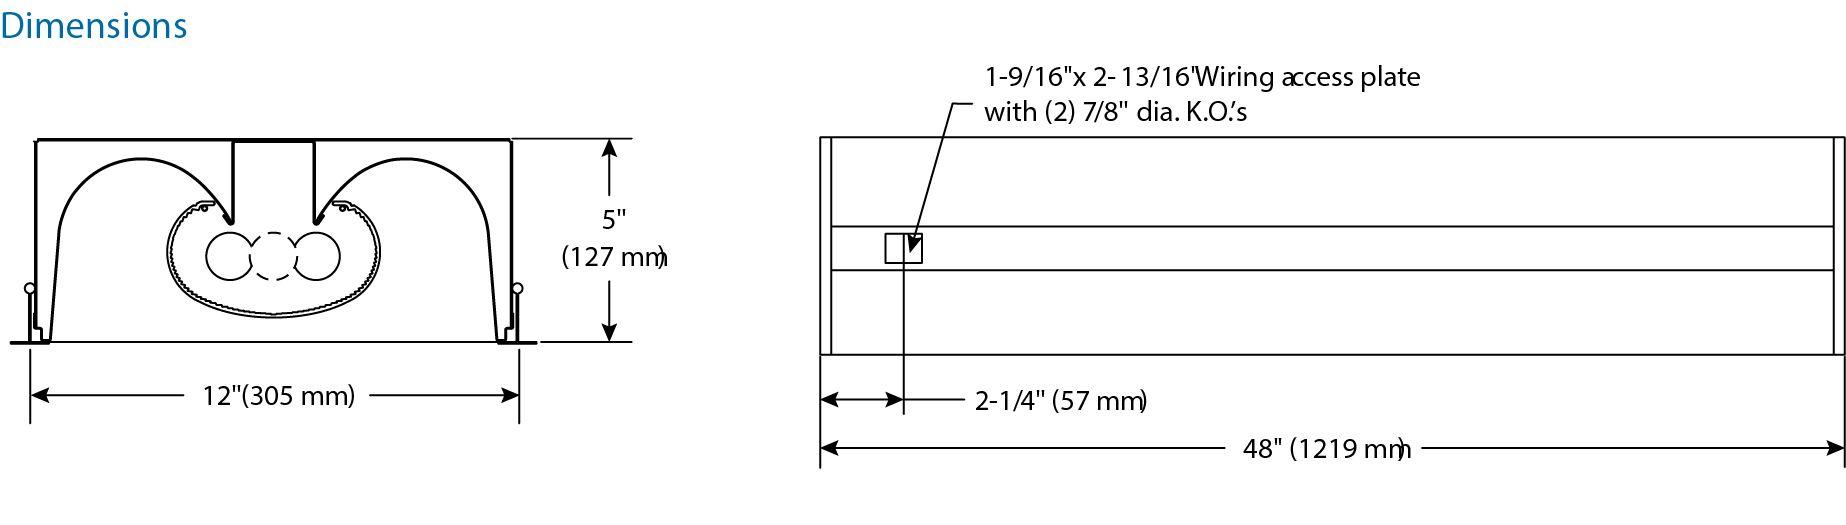 lightolier wiring diagram wiring library philips lightolier hp90 h9s1glr232unvhi recessed 1x4 fluorescent fixture 32 watt t8